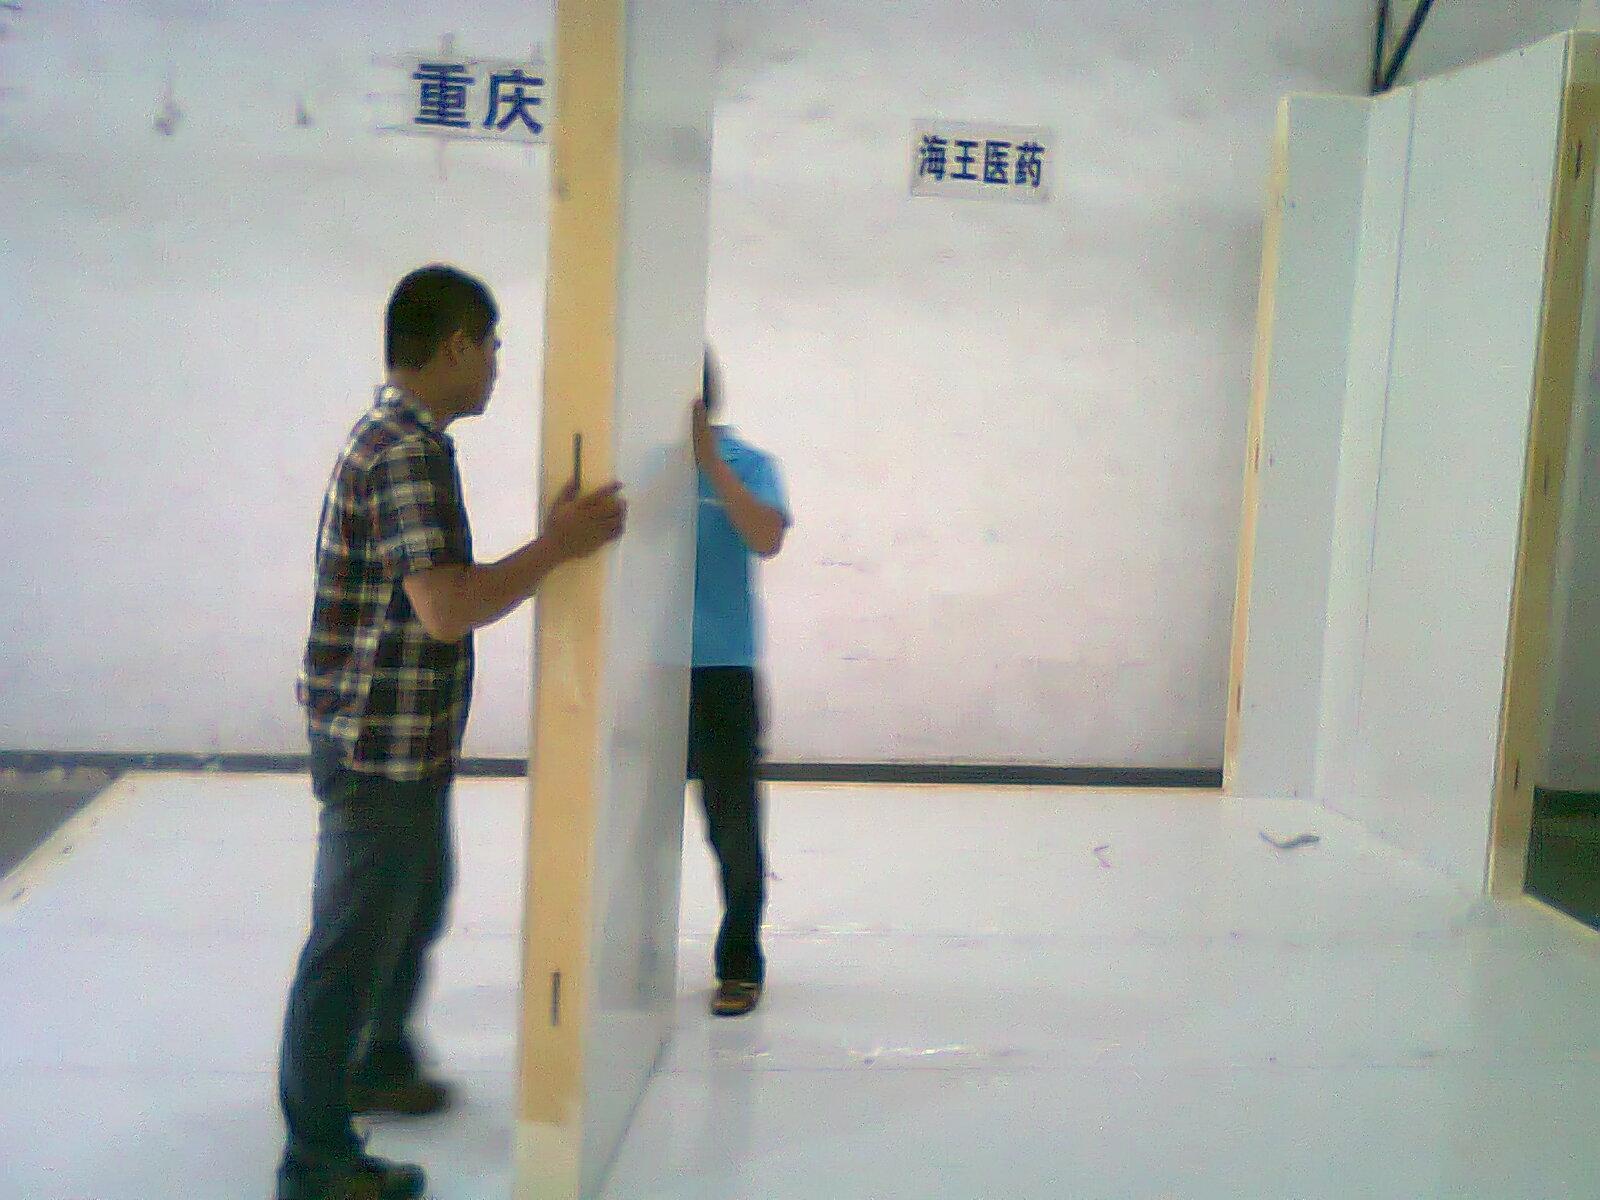 达缘供应链一期项目工程